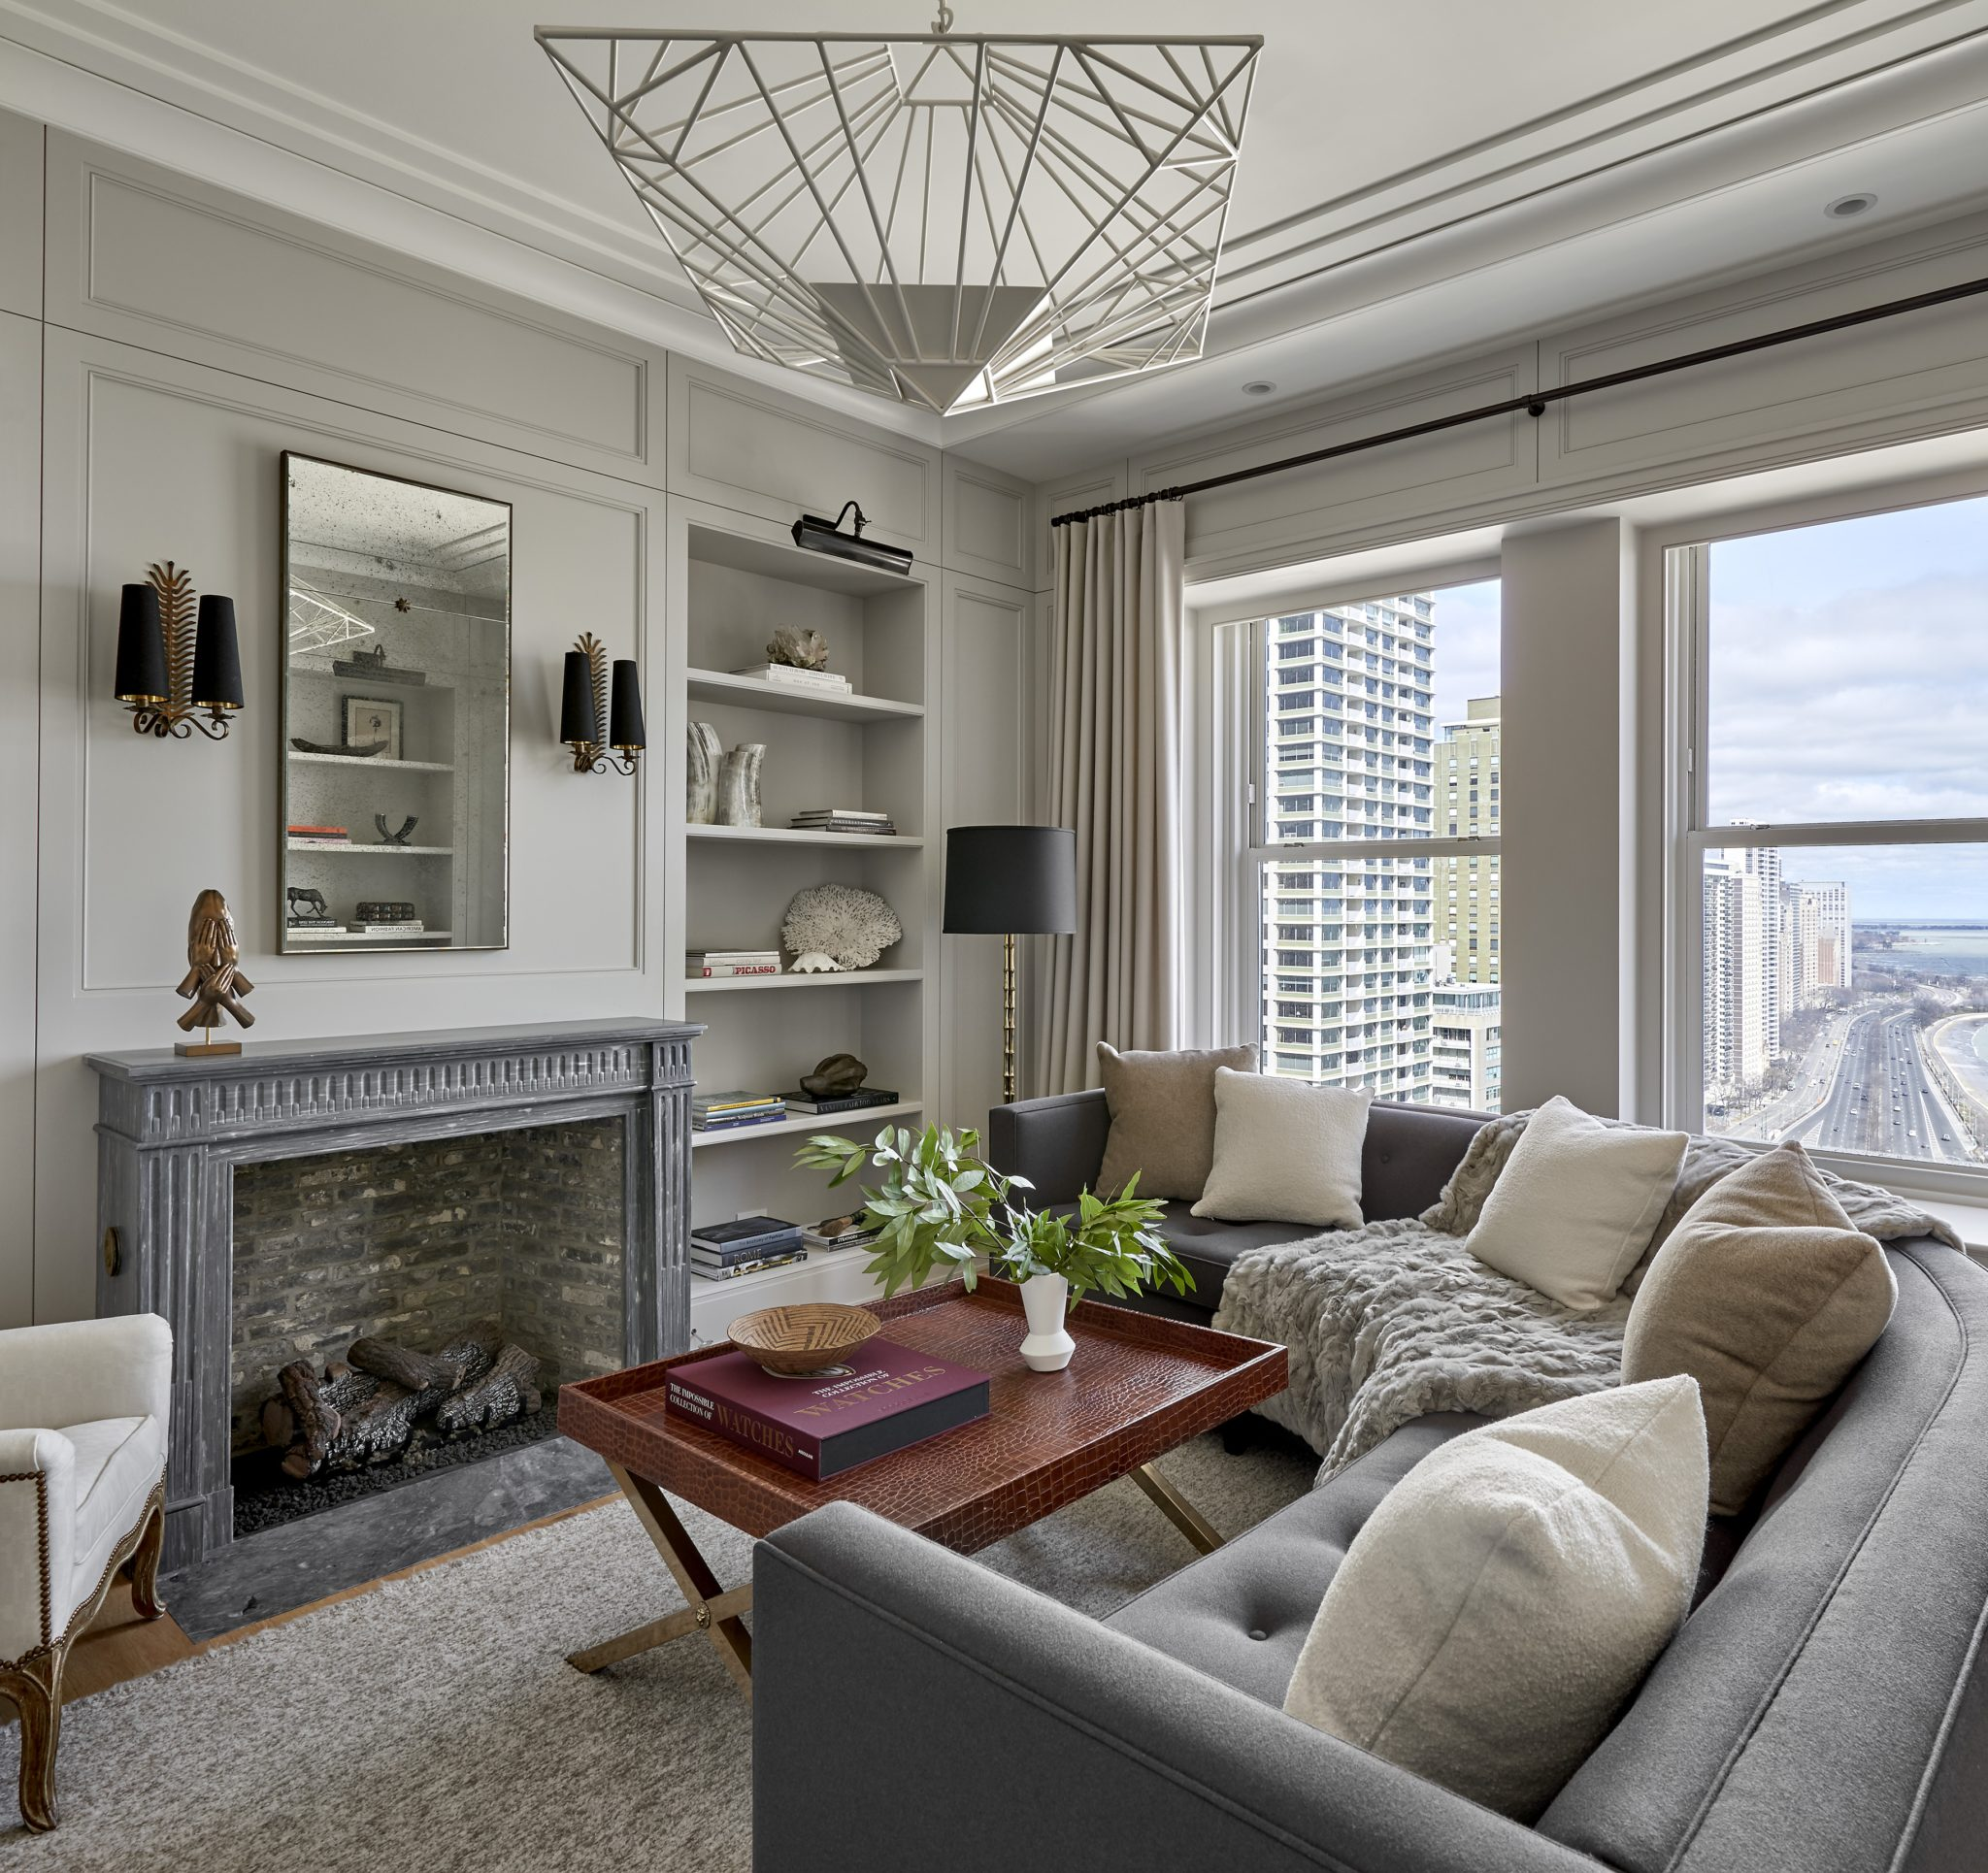 Historic Palmolive Building Residence Living Room. Interior Architectureby Kadlec Architecture + Design.